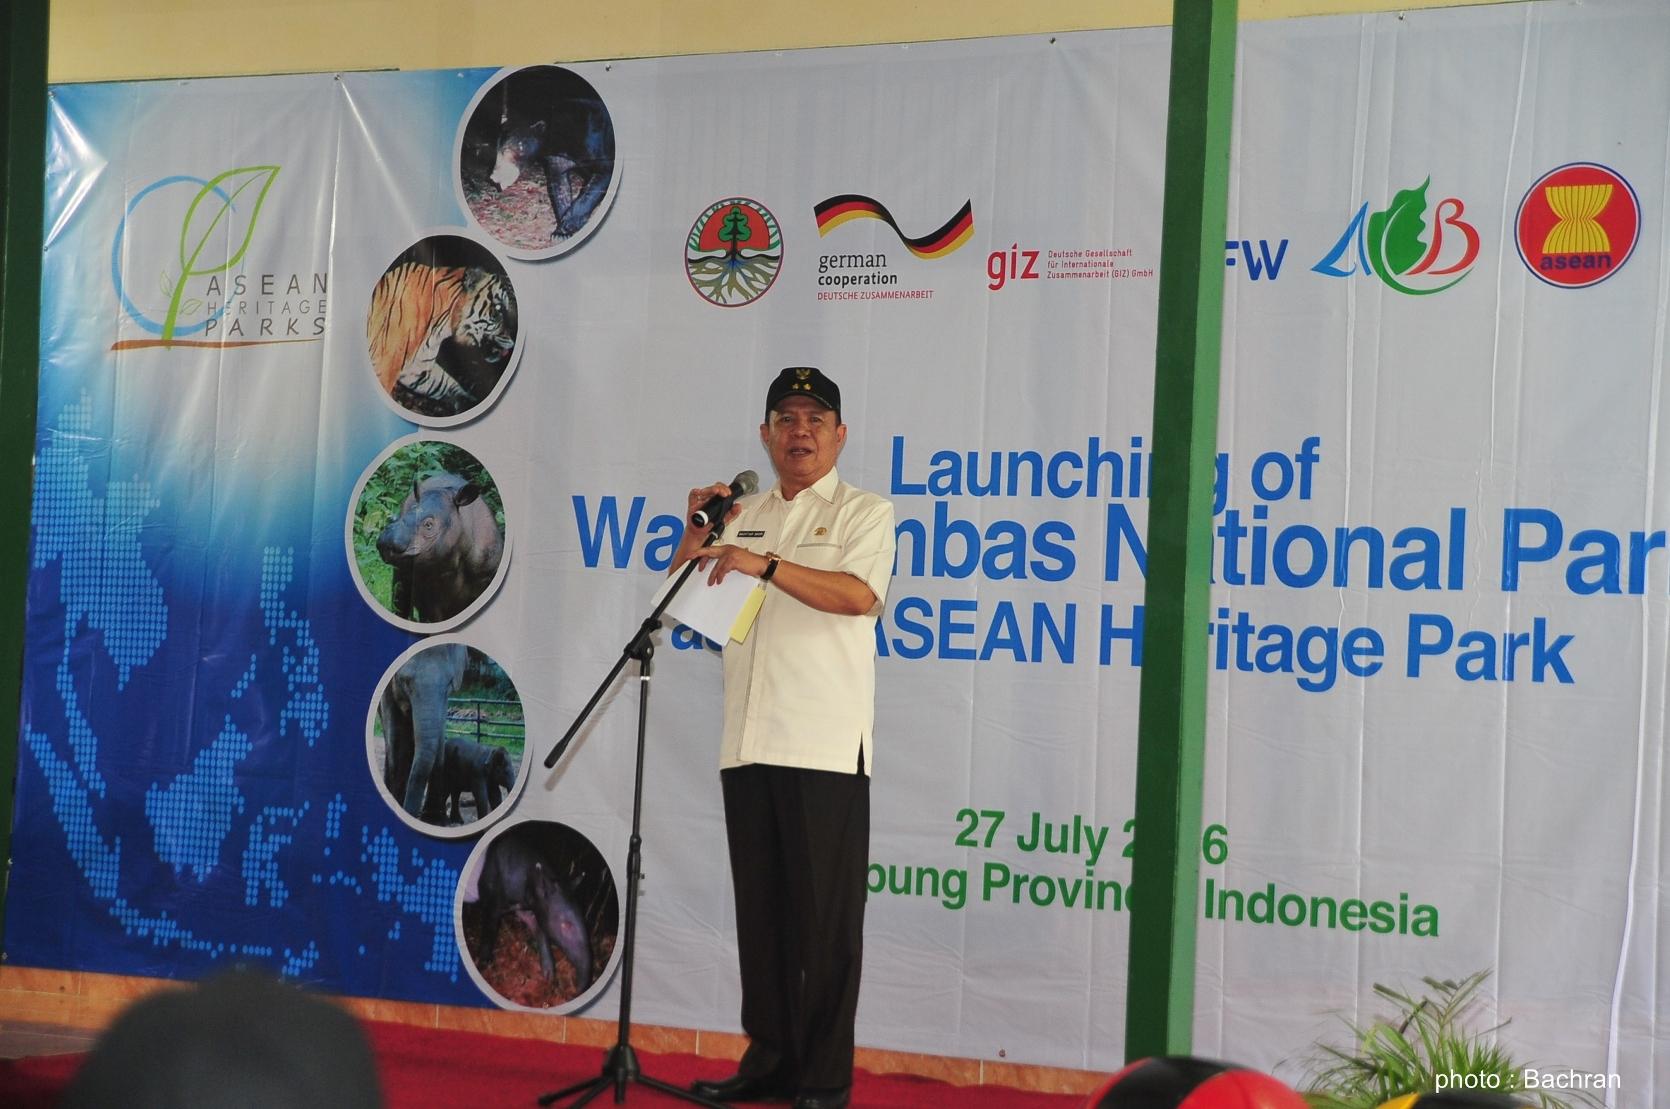 sambutan dari Wakil Gubernur Lampung, Bapak Bachtiar Basri